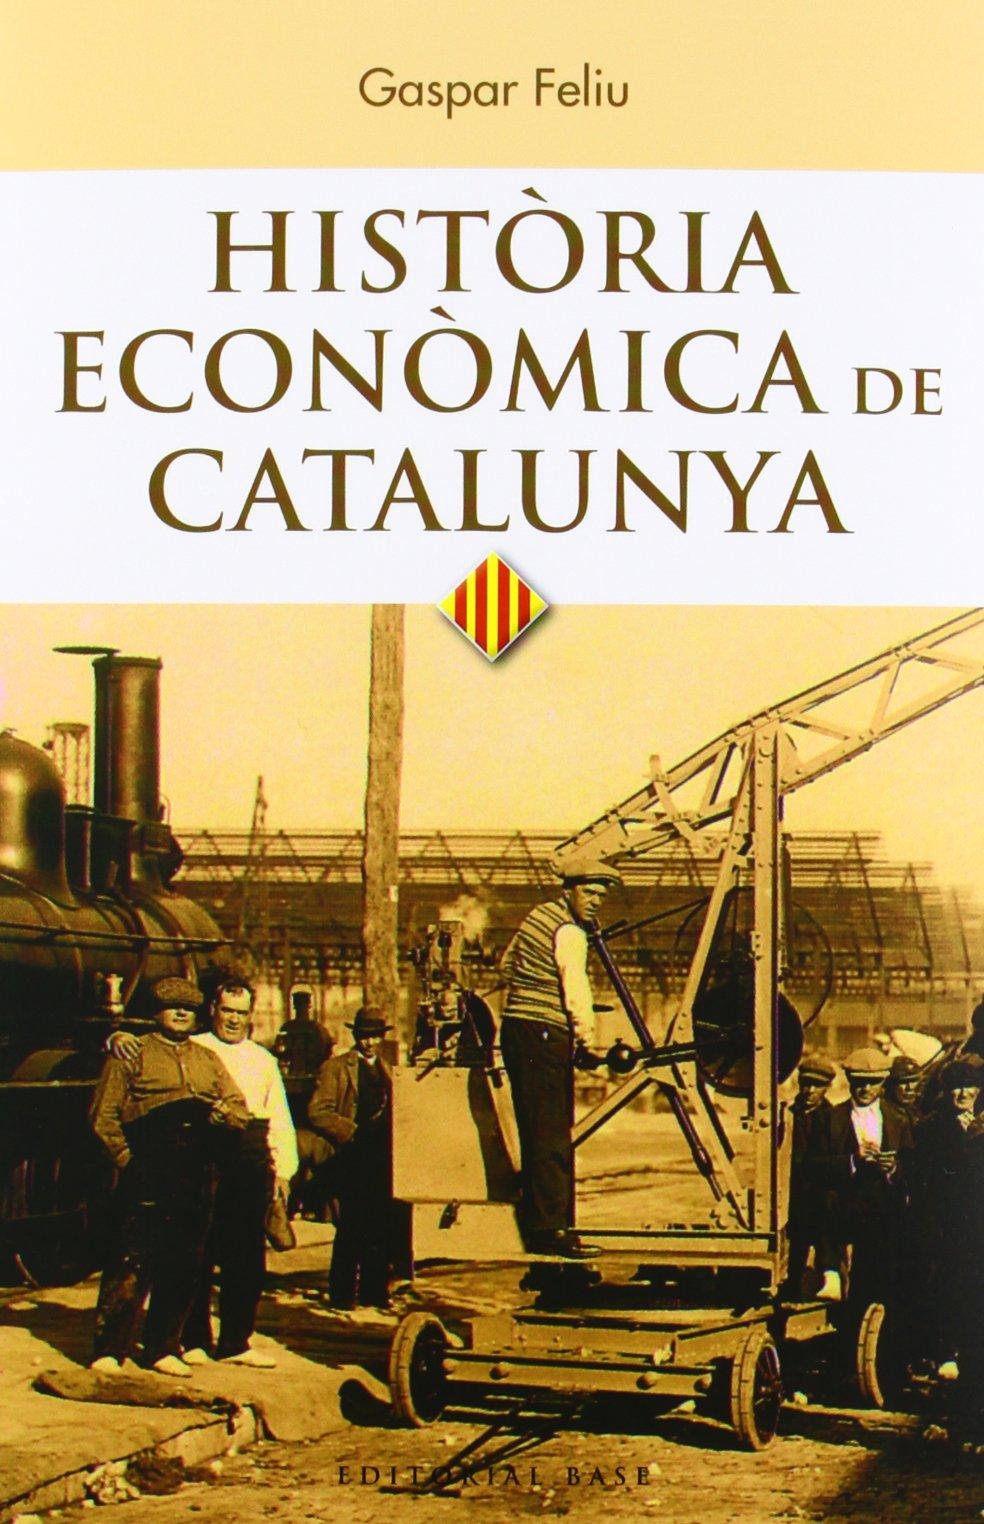 Història econòmica de Catalunya: 95 (Base Històrica): Amazon.es: Feliu Monfort, Gaspar: Libros